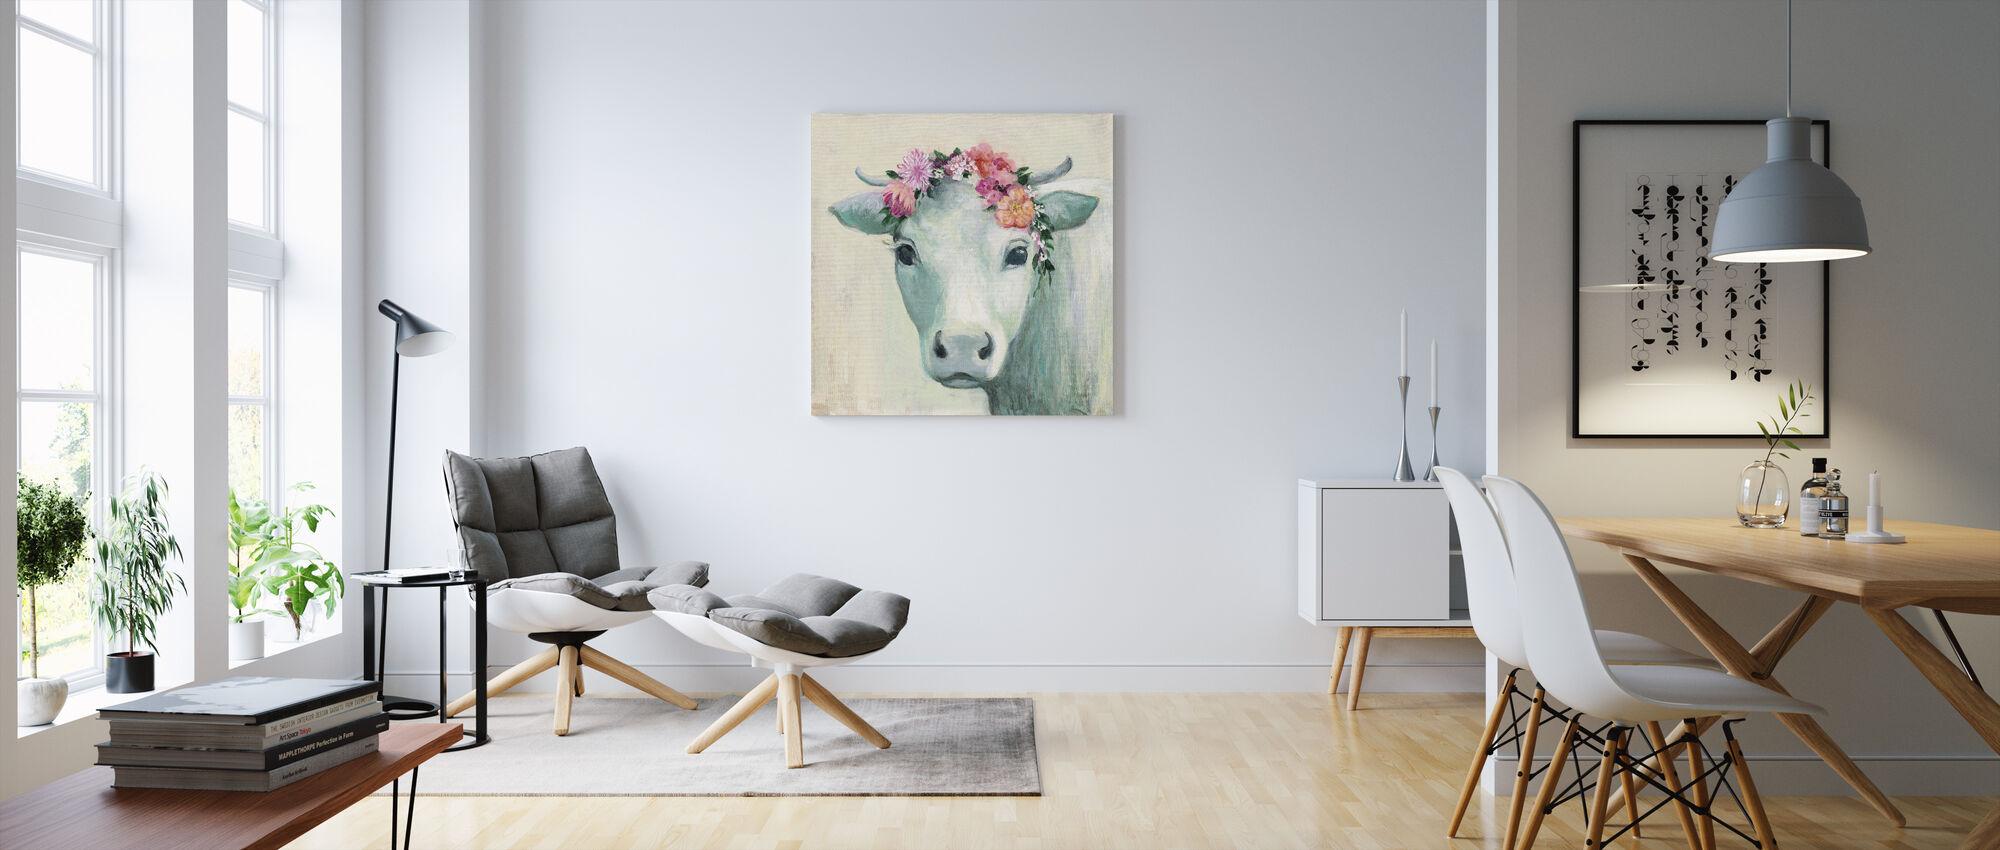 Festival Girl II - Canvas print - Living Room